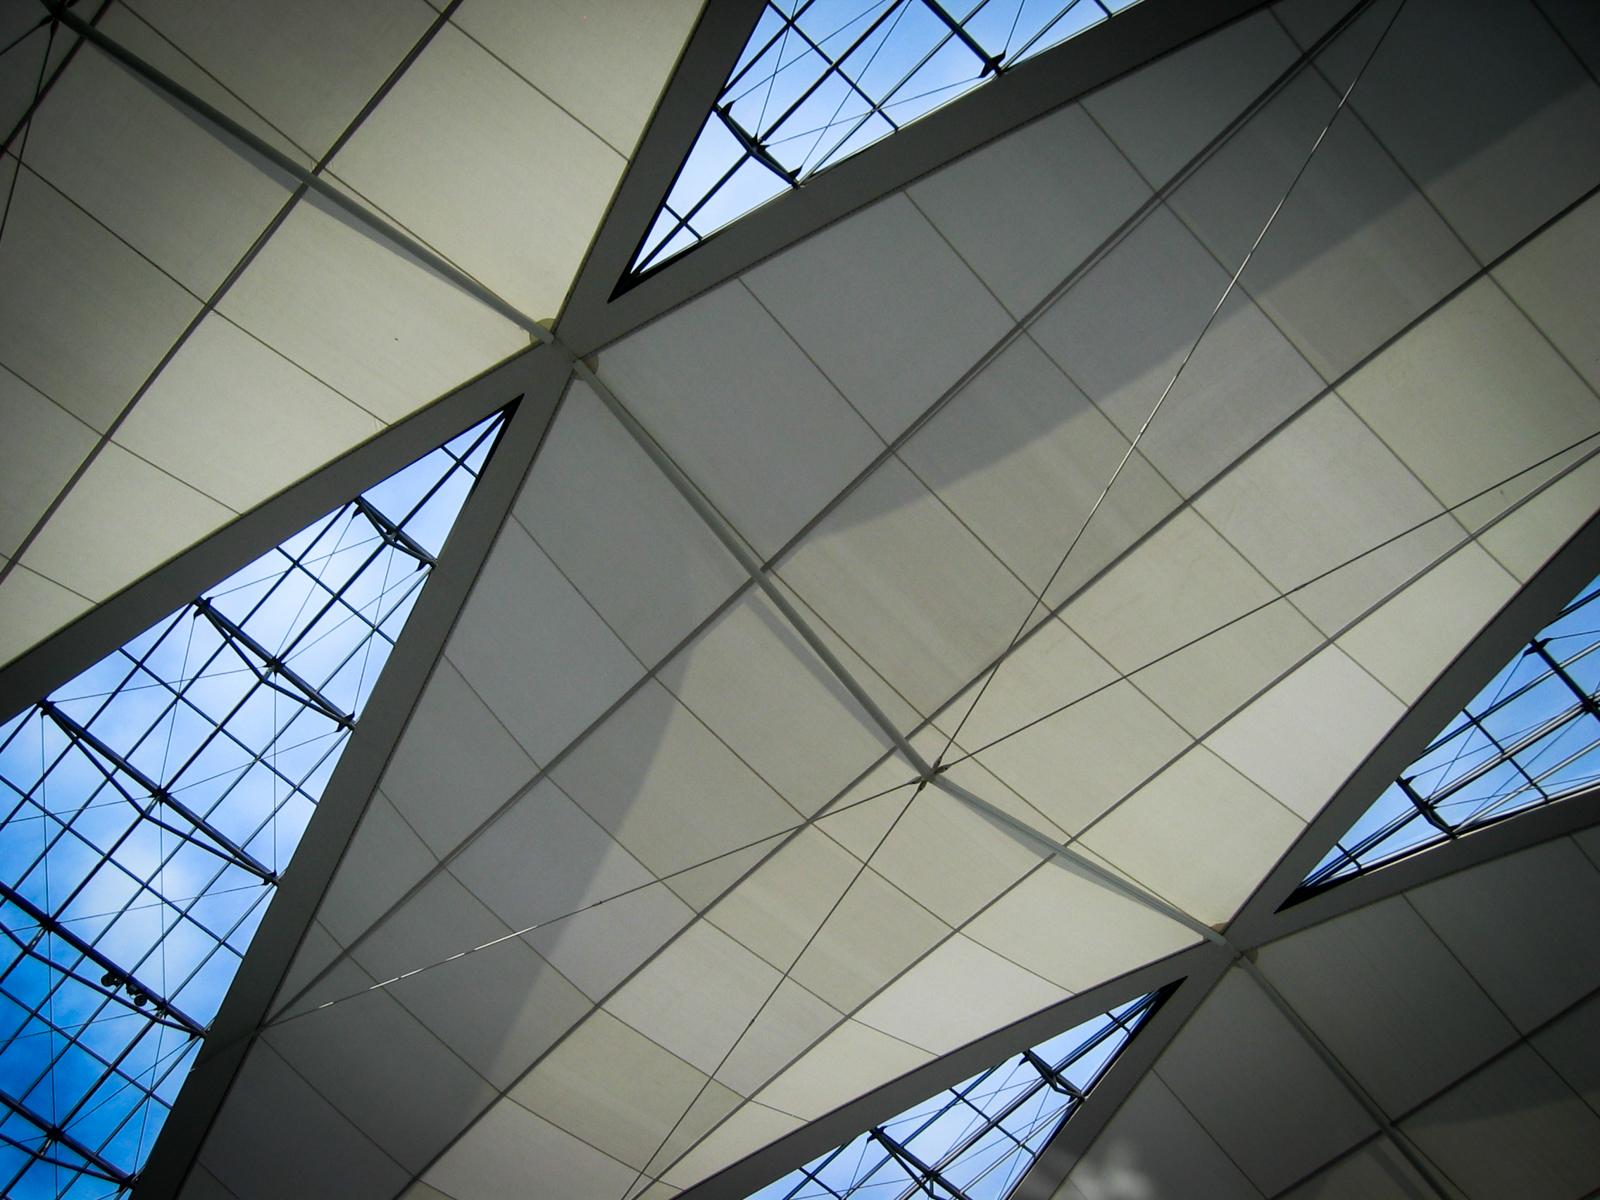 Munich Airport Centre